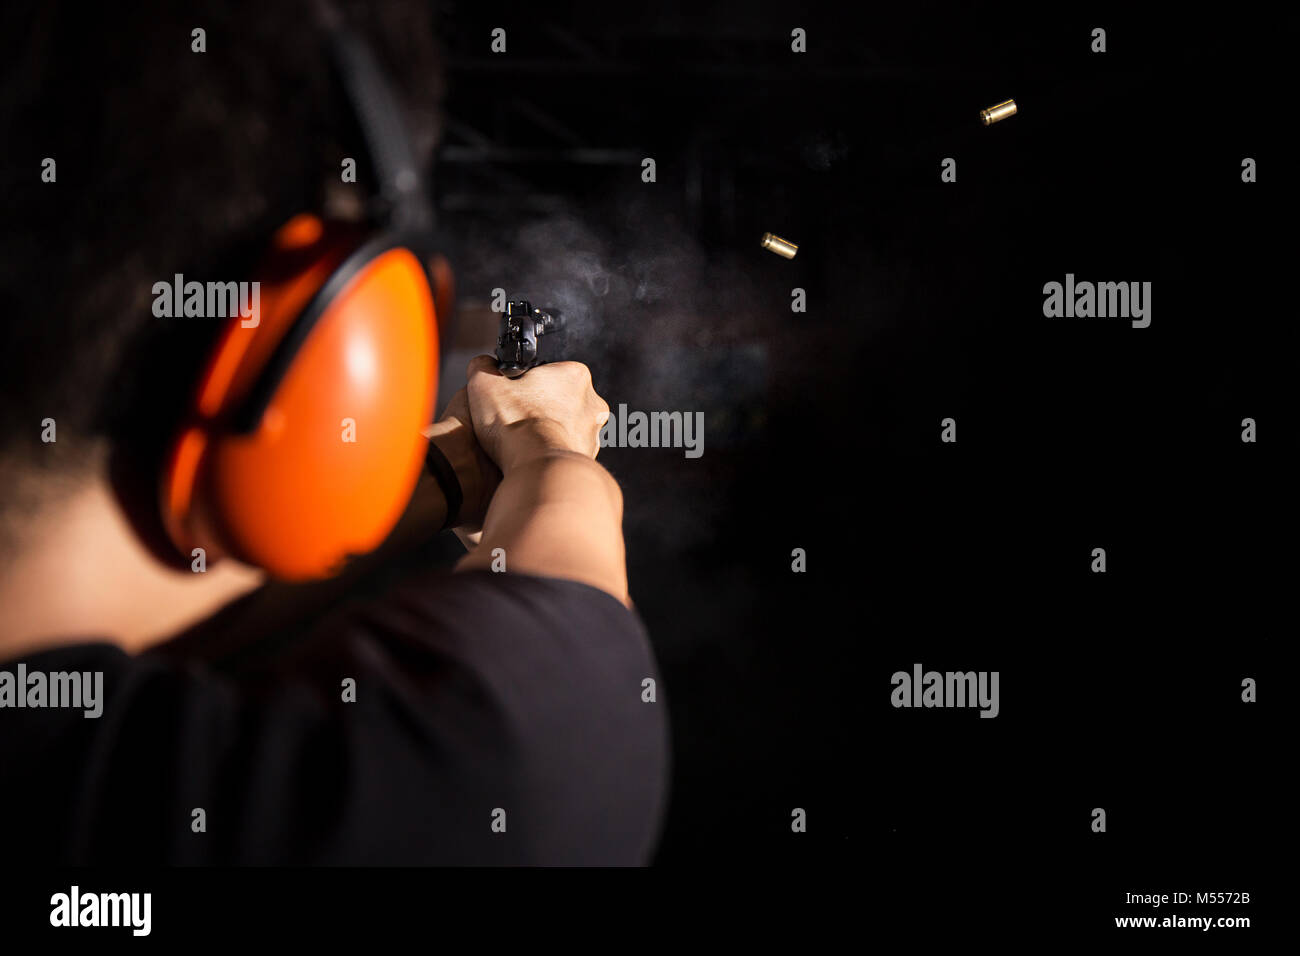 man shooting pistol gun, fire bullet, and wear orange ear cover in shooting range - Stock Image